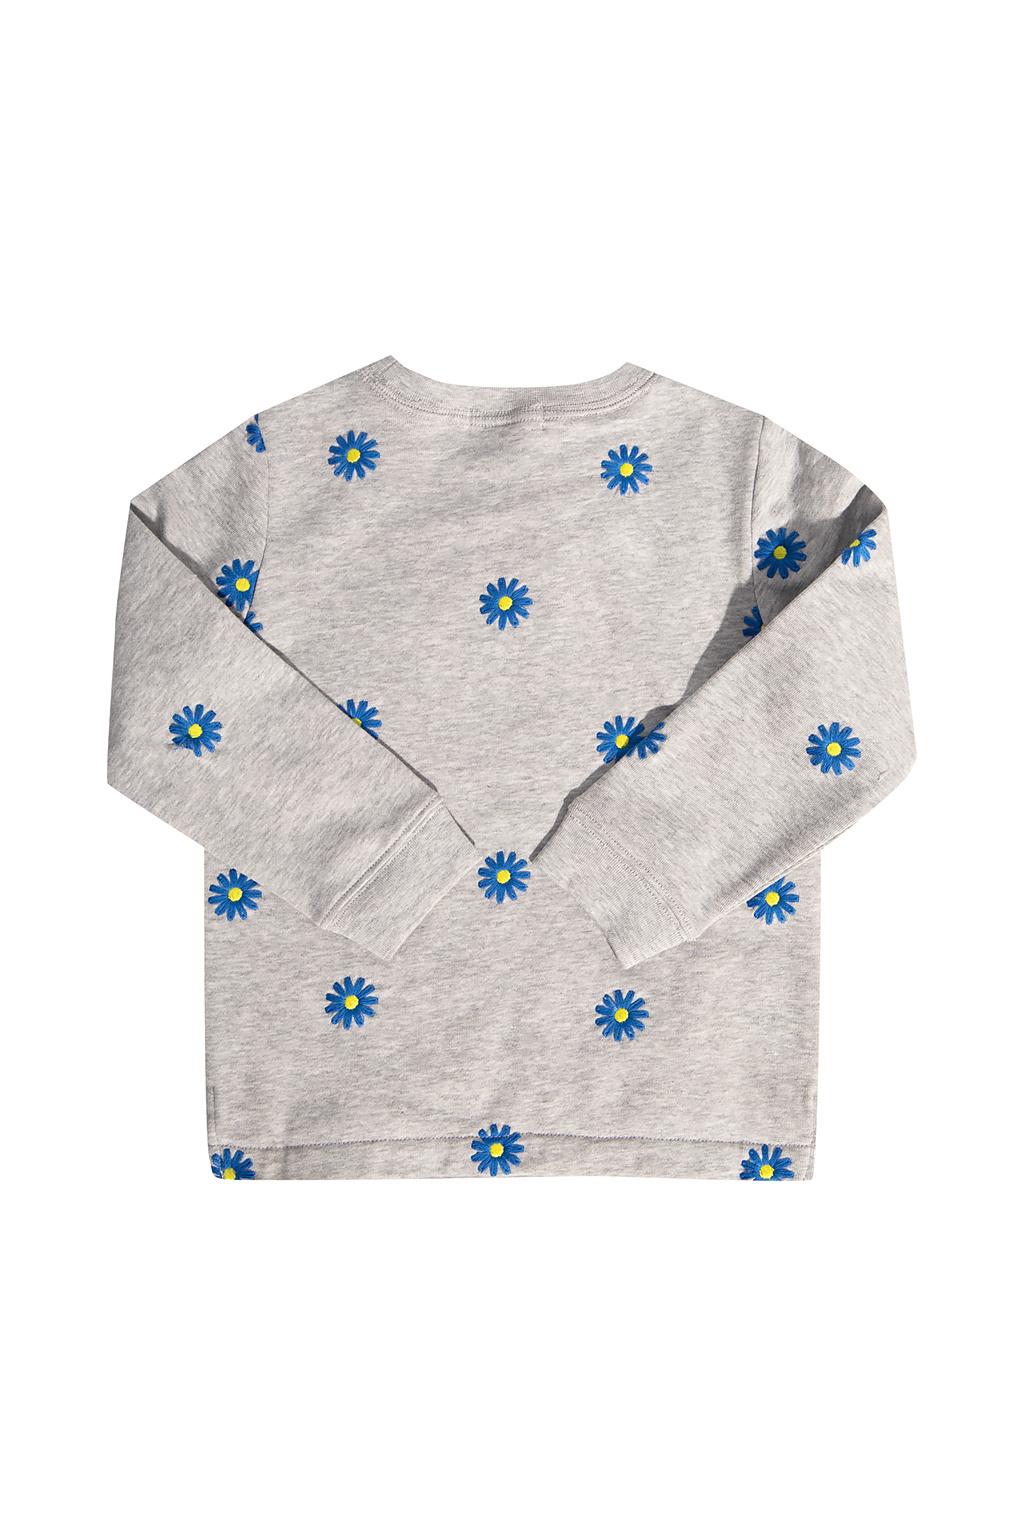 Stella McCartney Kids Embroidered sweatshirt